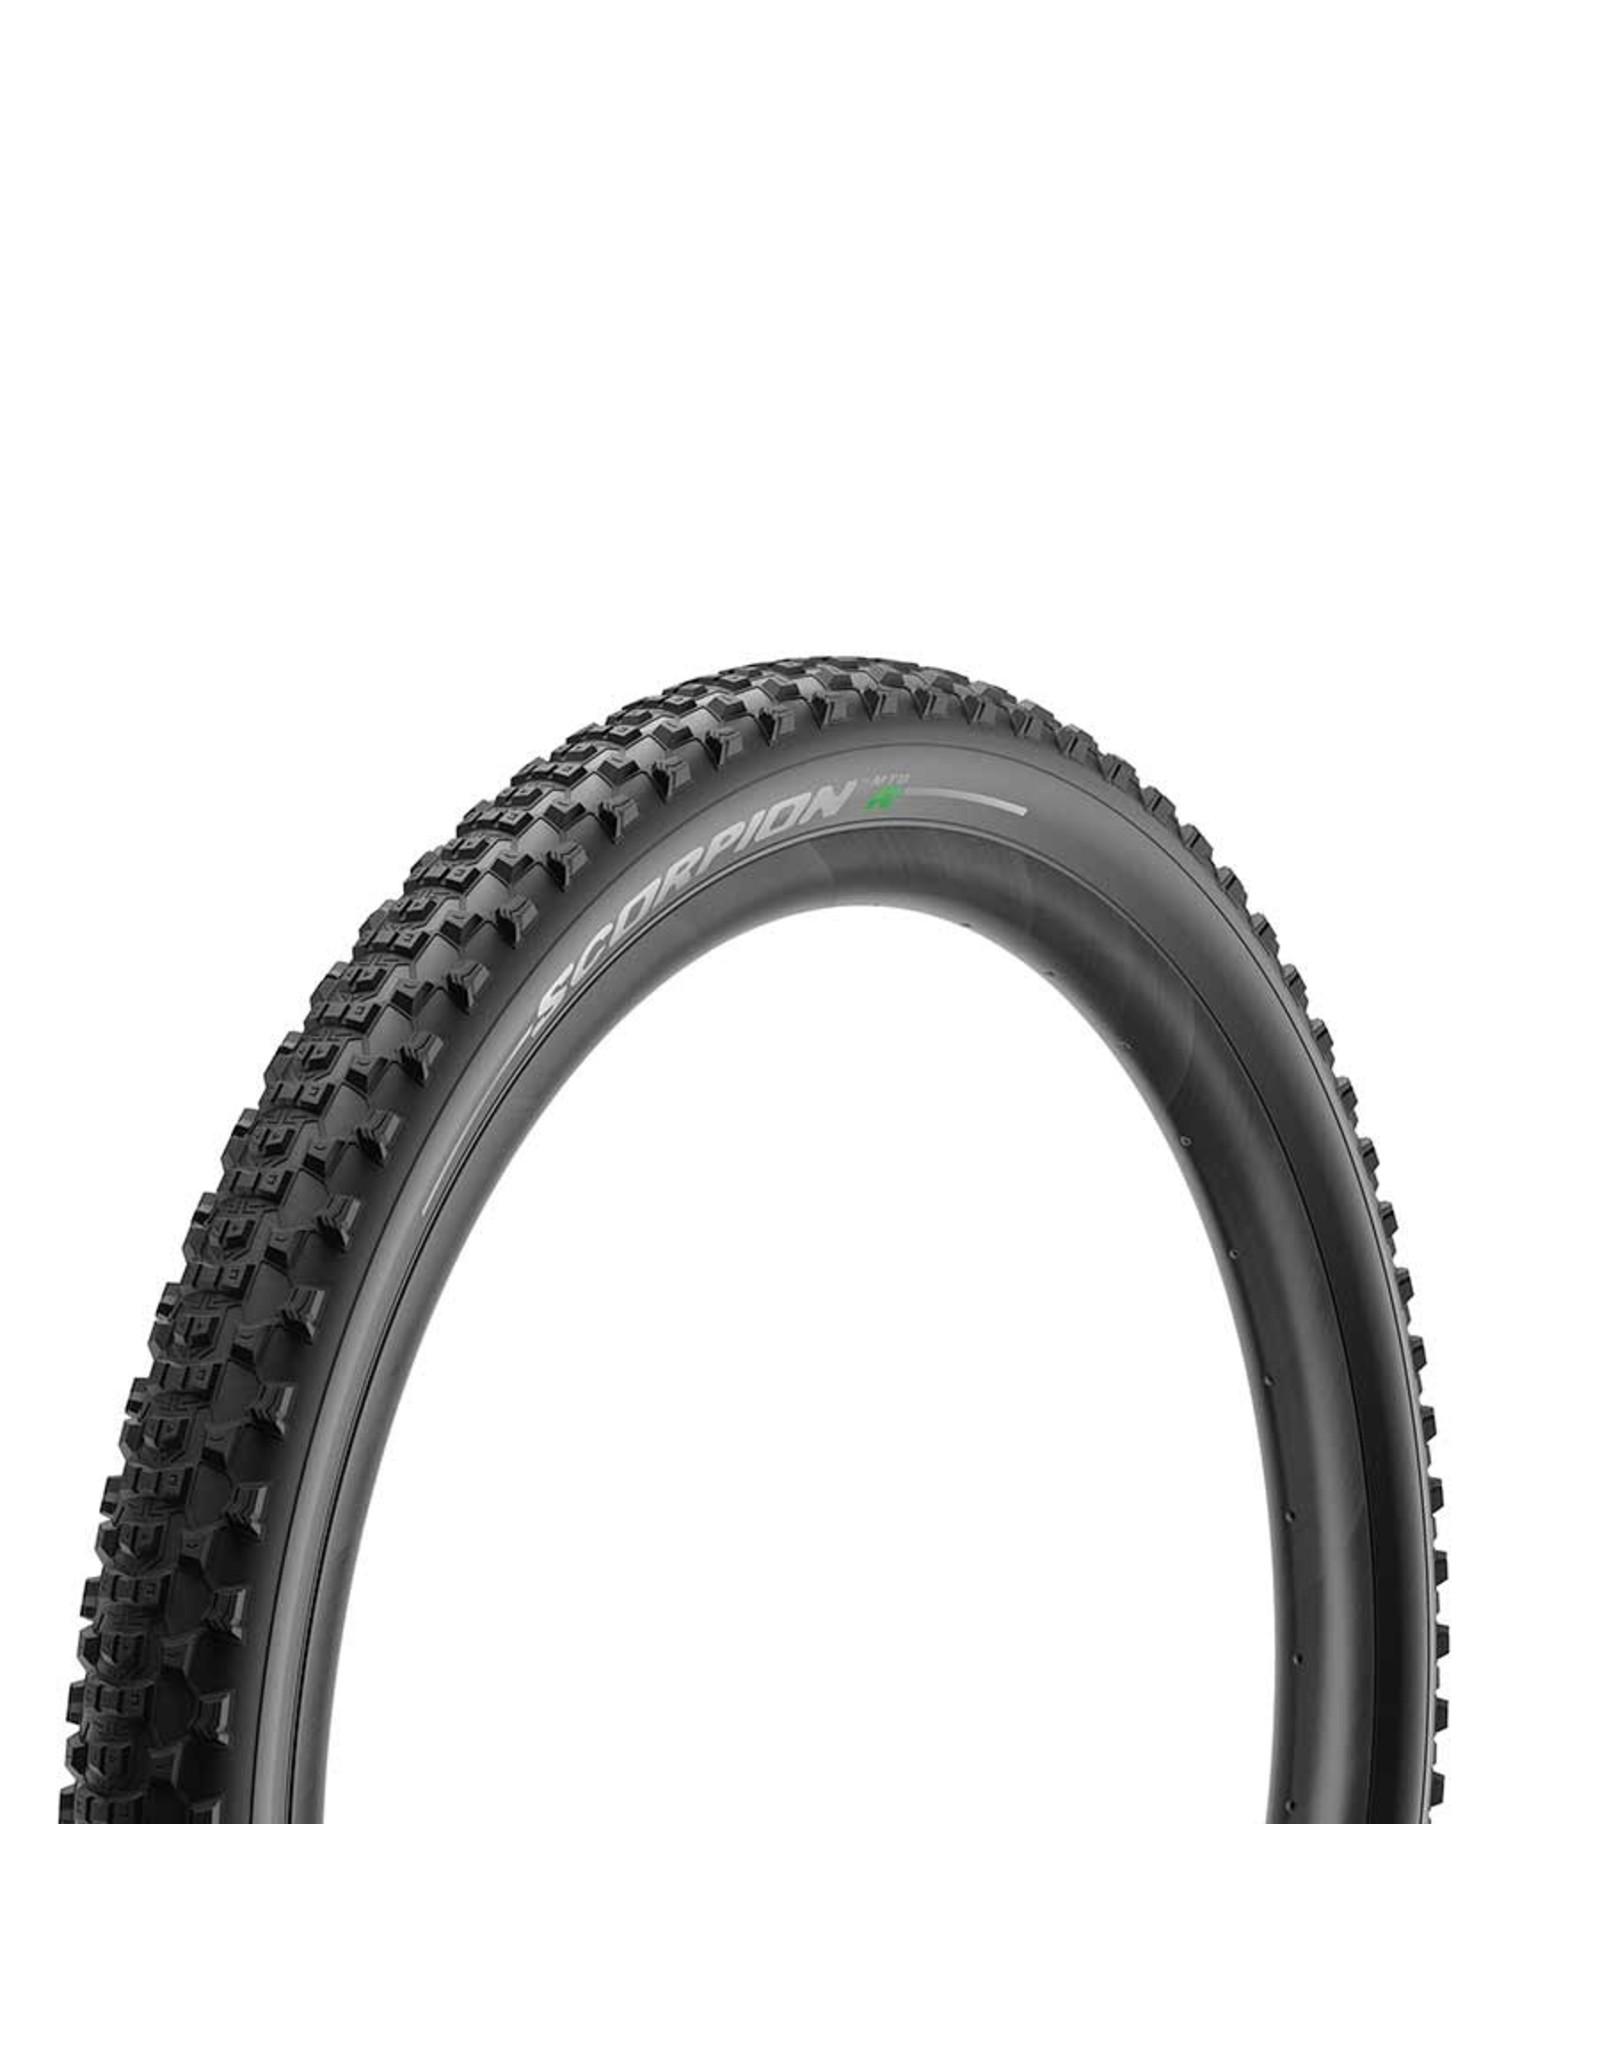 Pirelli, Scorpion MTB R, Tire, 27.5x2.4, Folding, Tubeless Ready, Smartgrip, Hyperwall, 127TPI, Black